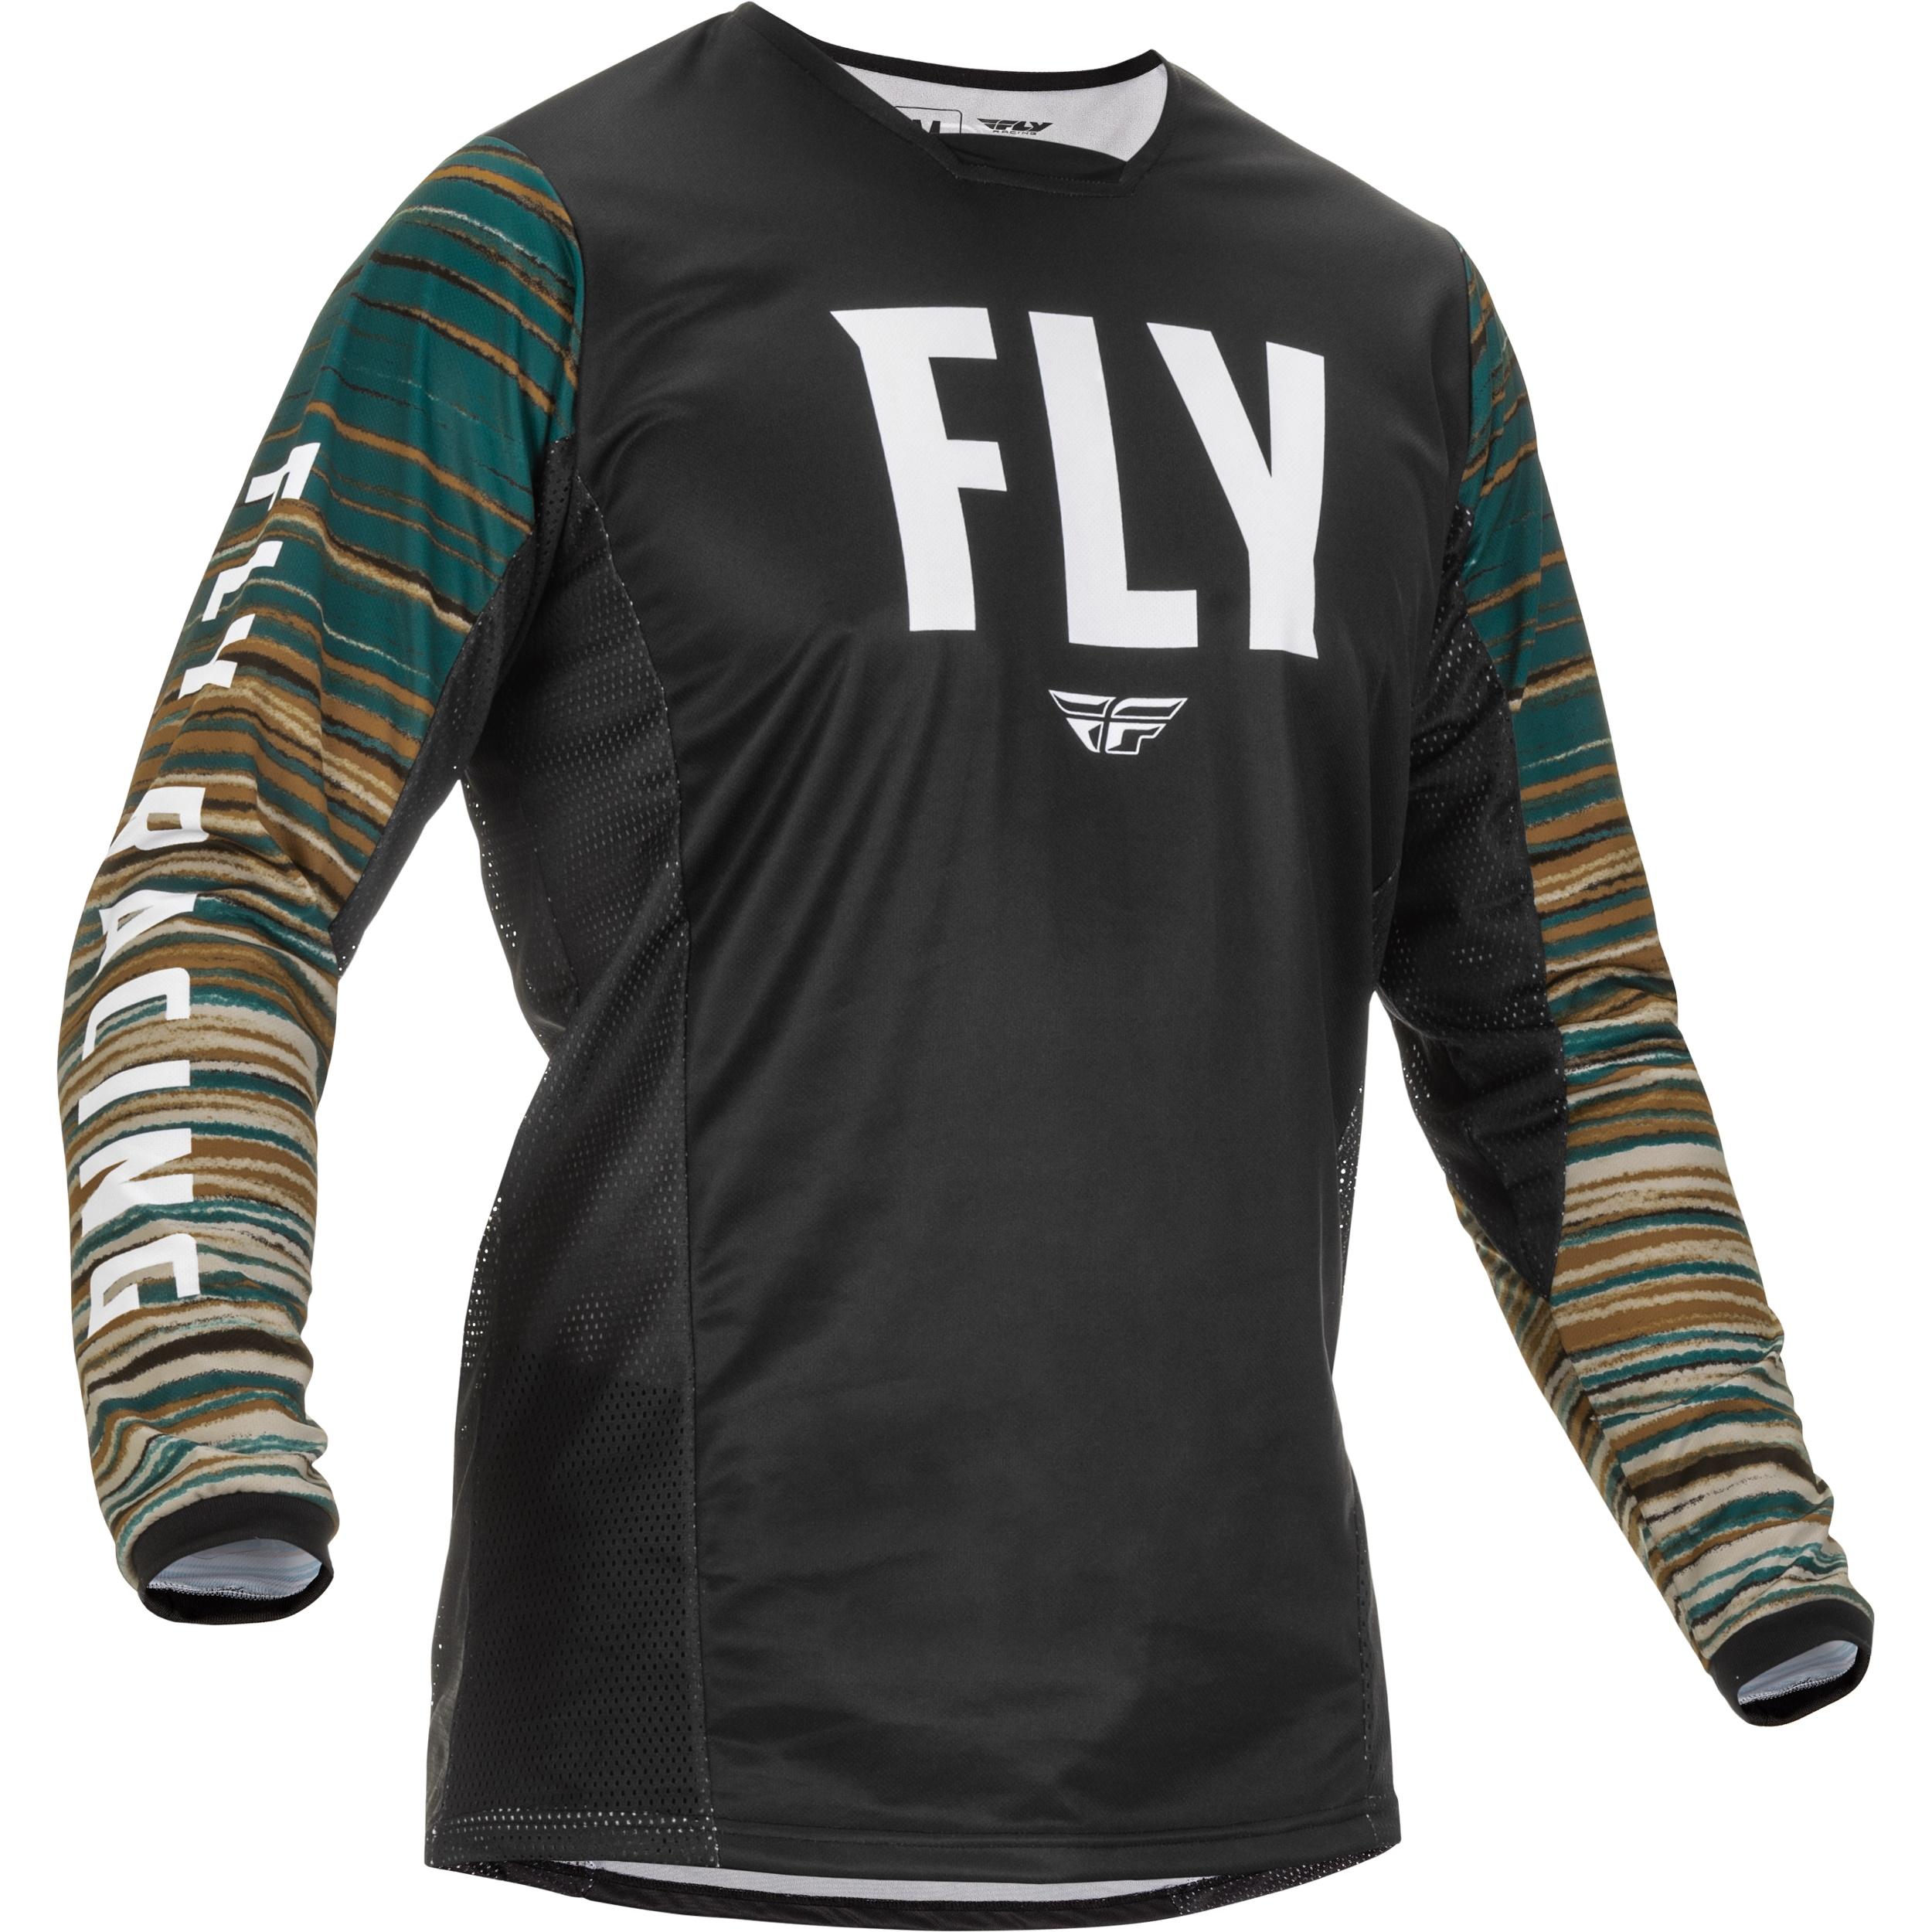 Fly Racing 2022 Kinetic Wave Black/Rum Jersey